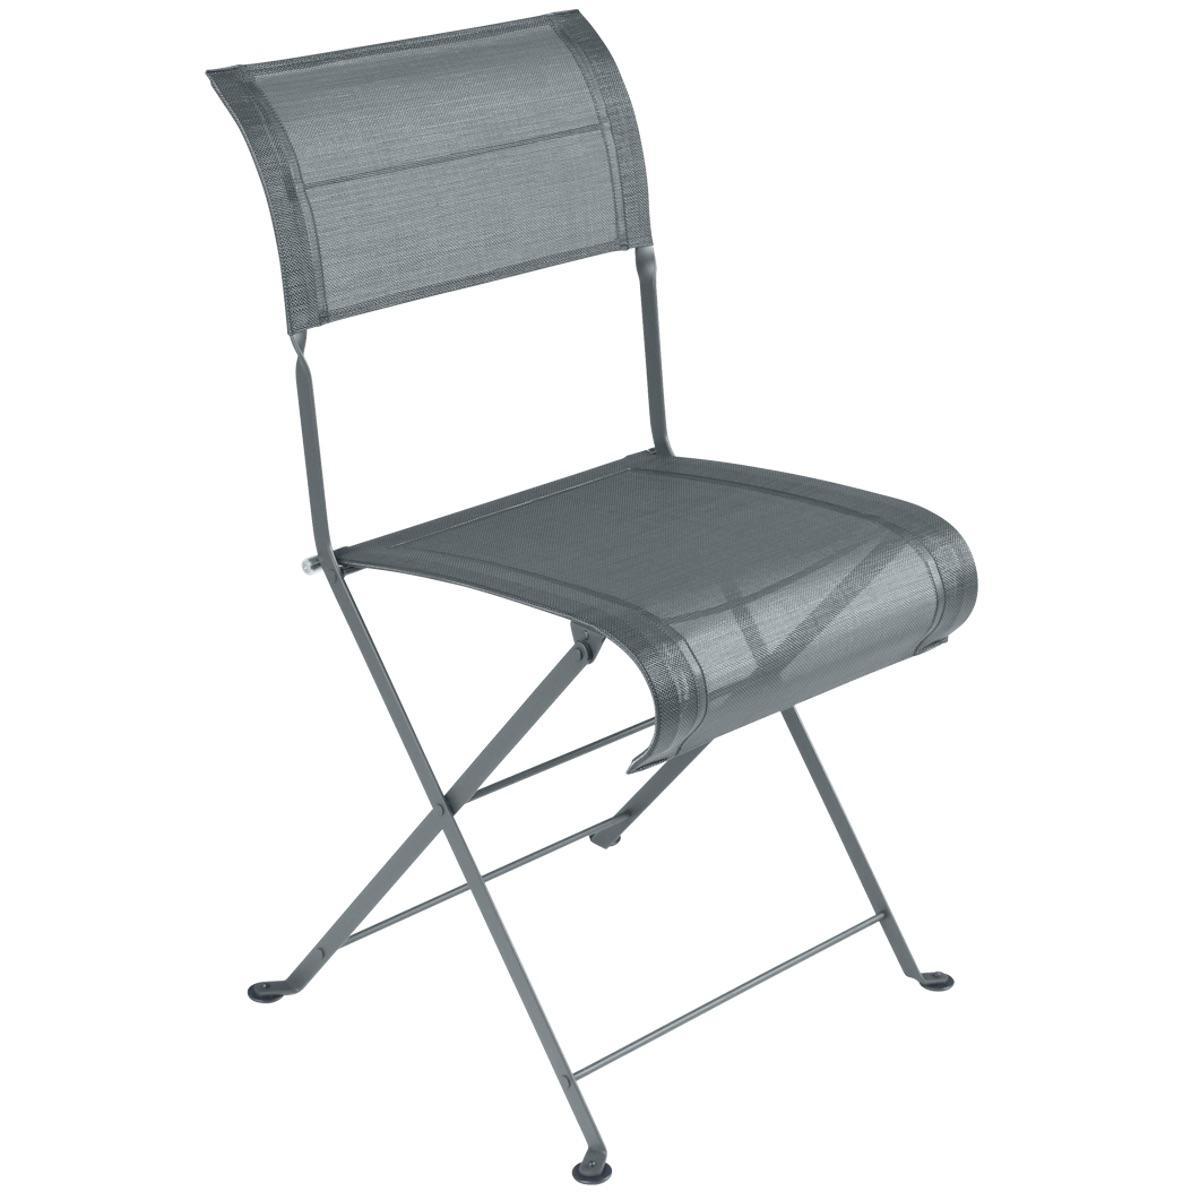 Chaise pliante DUNE PREMIUM Fermob gris orage